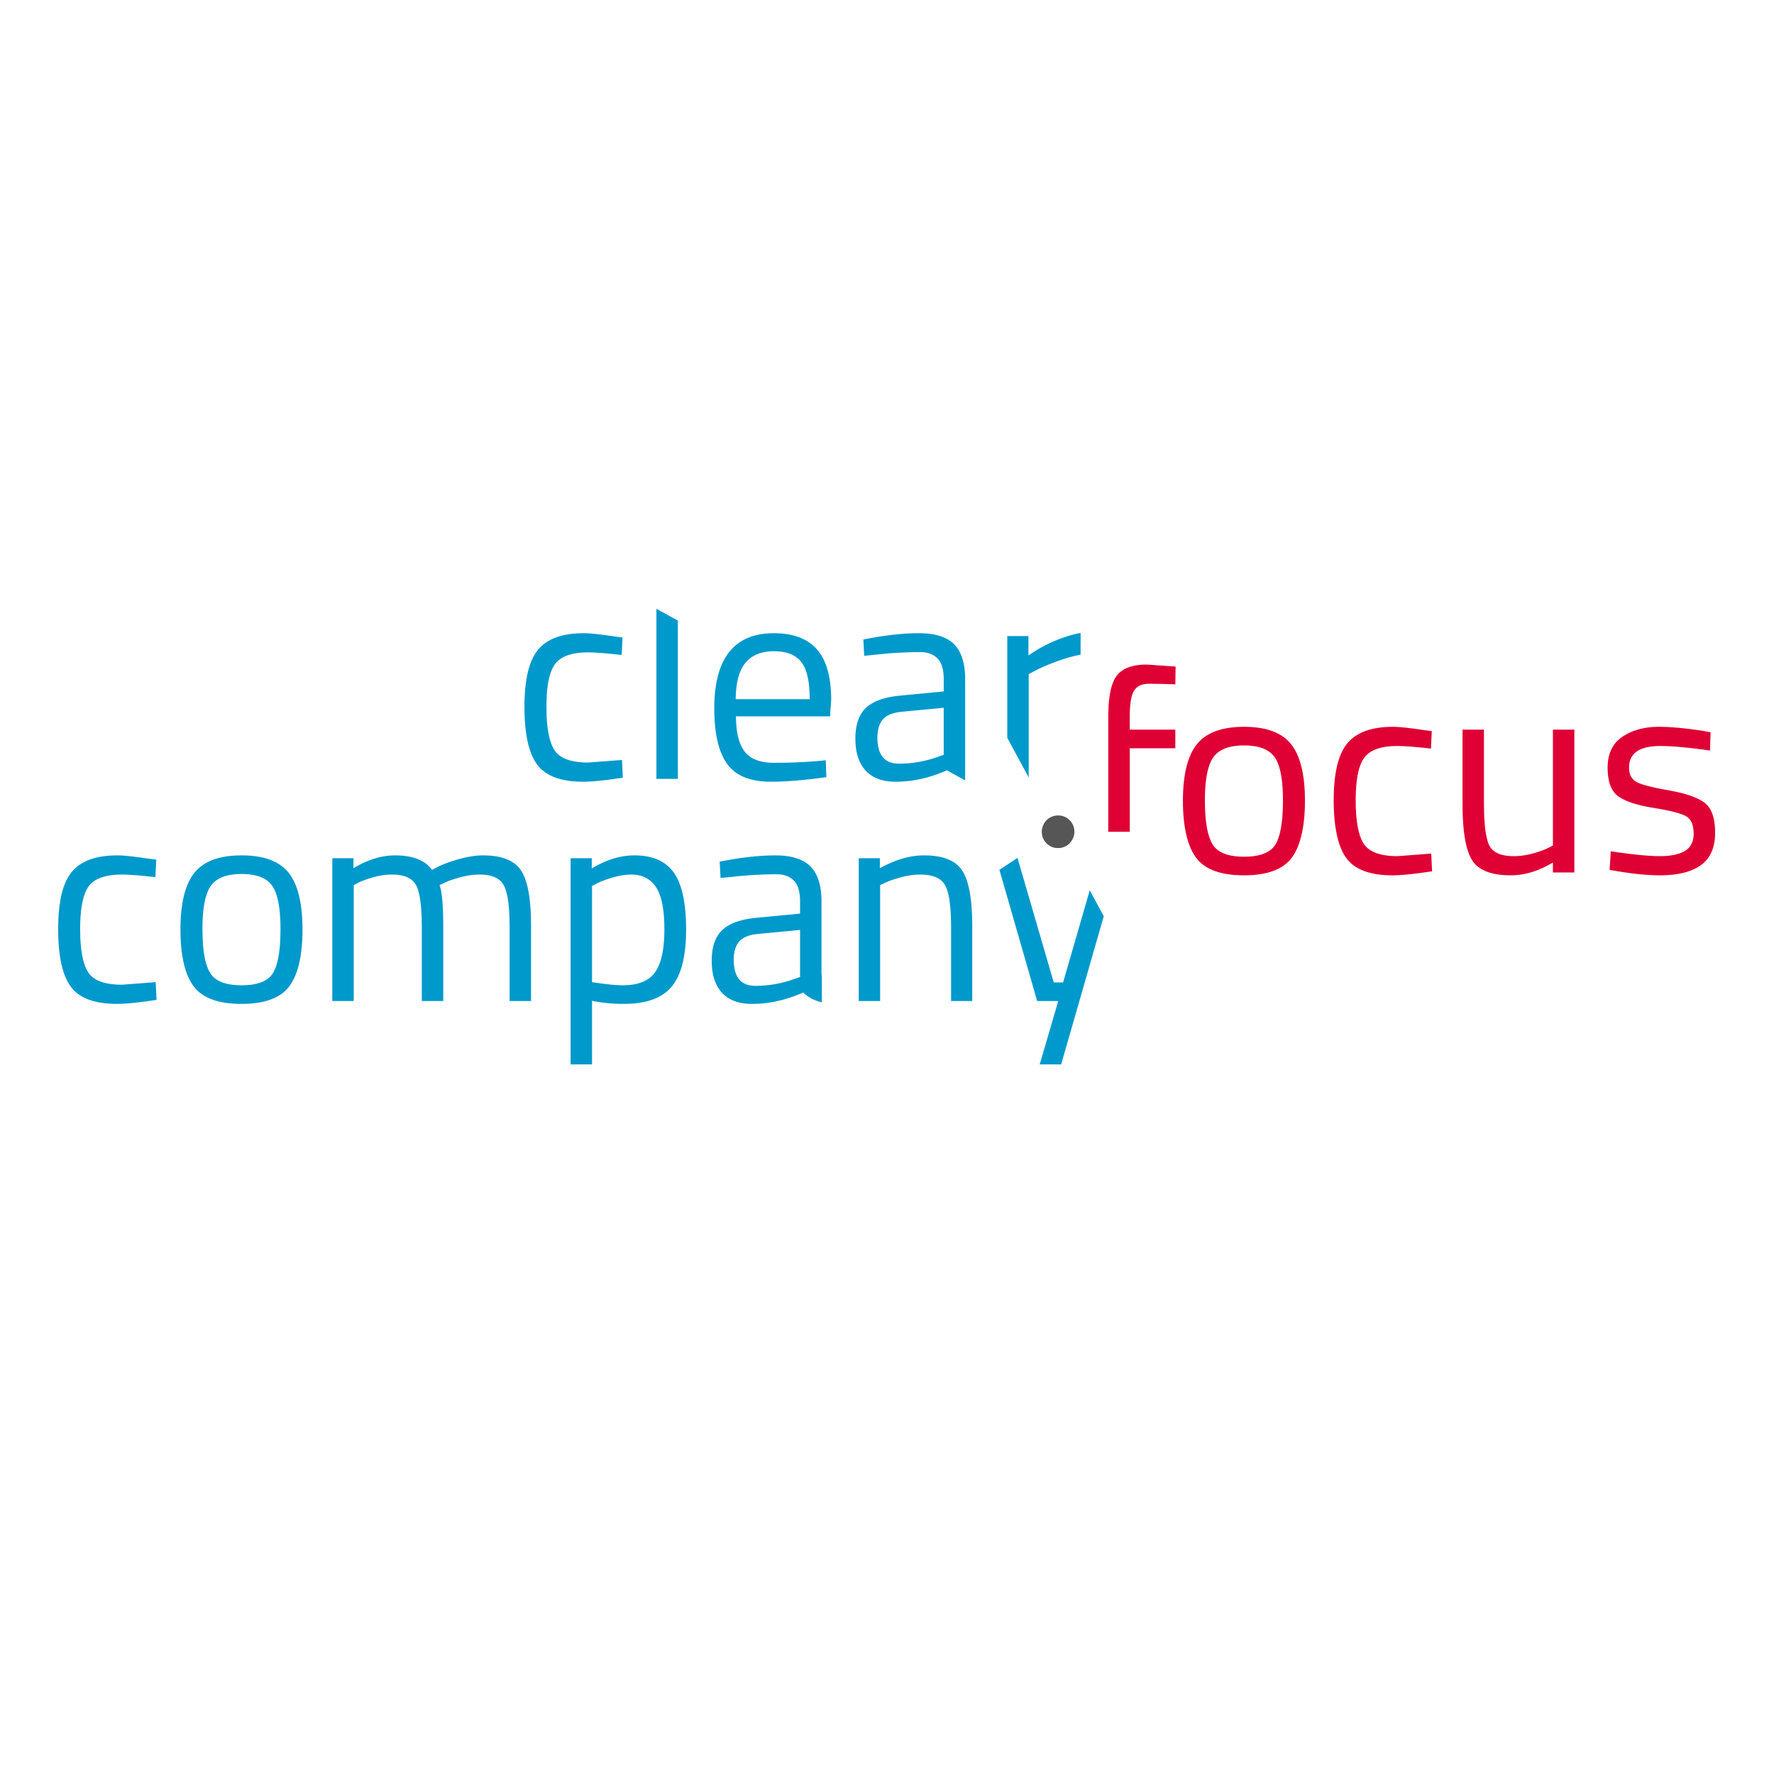 Clear Focus Company